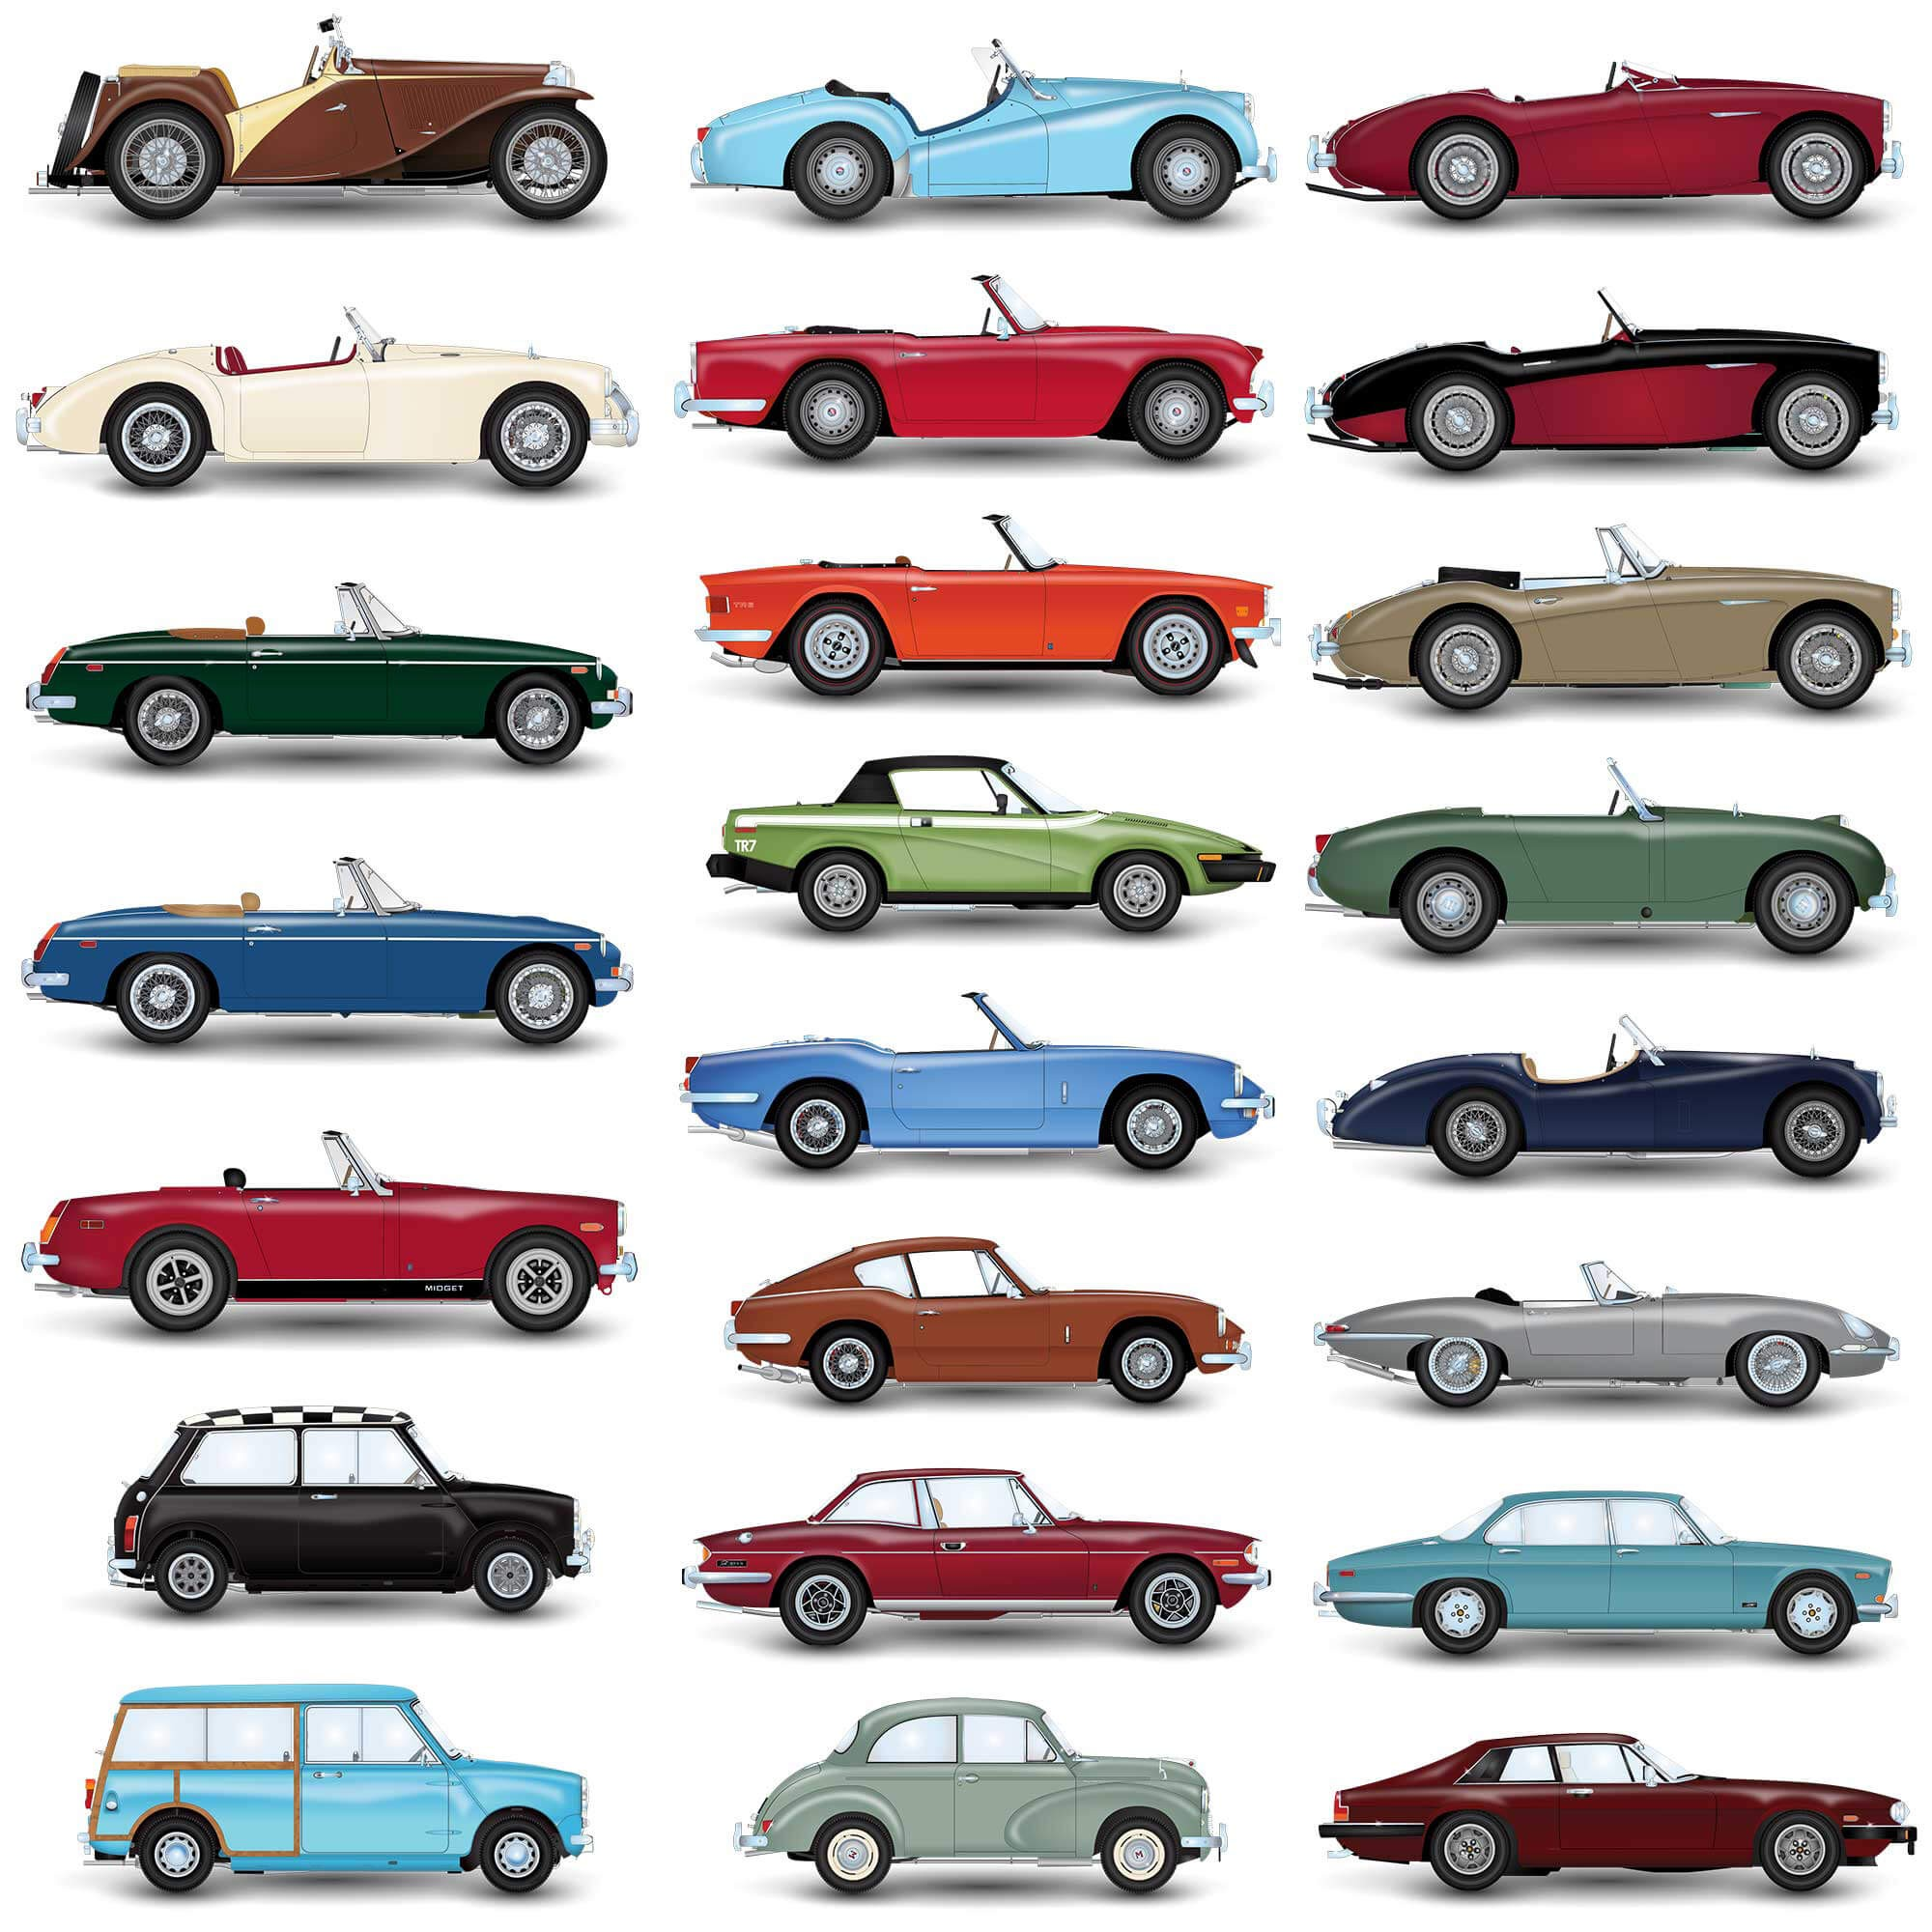 Moss Motors Bmw >> Moss Motors Catalogs Moss Motors